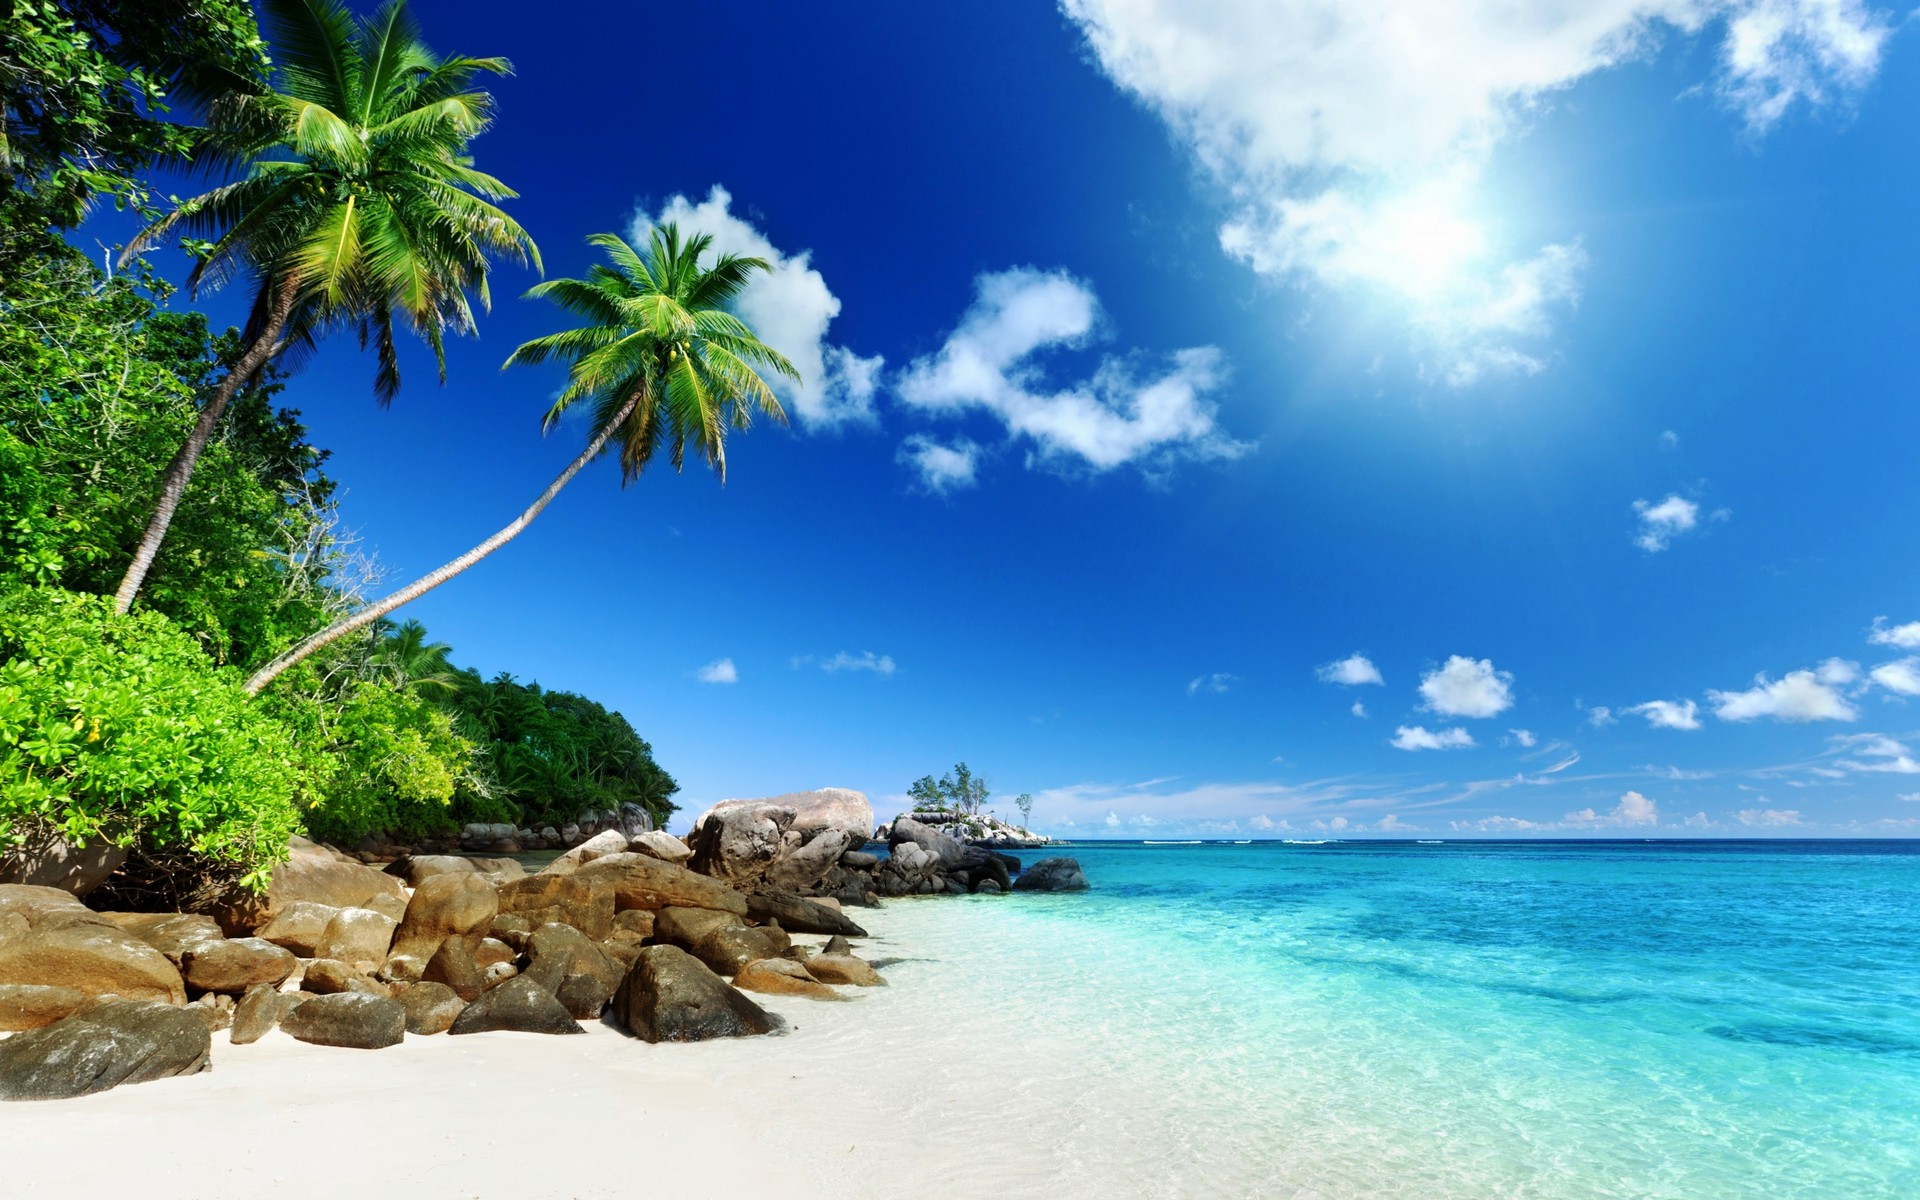 nature, Tropical, Island, Clouds Wallpapers HD / Desktop ...